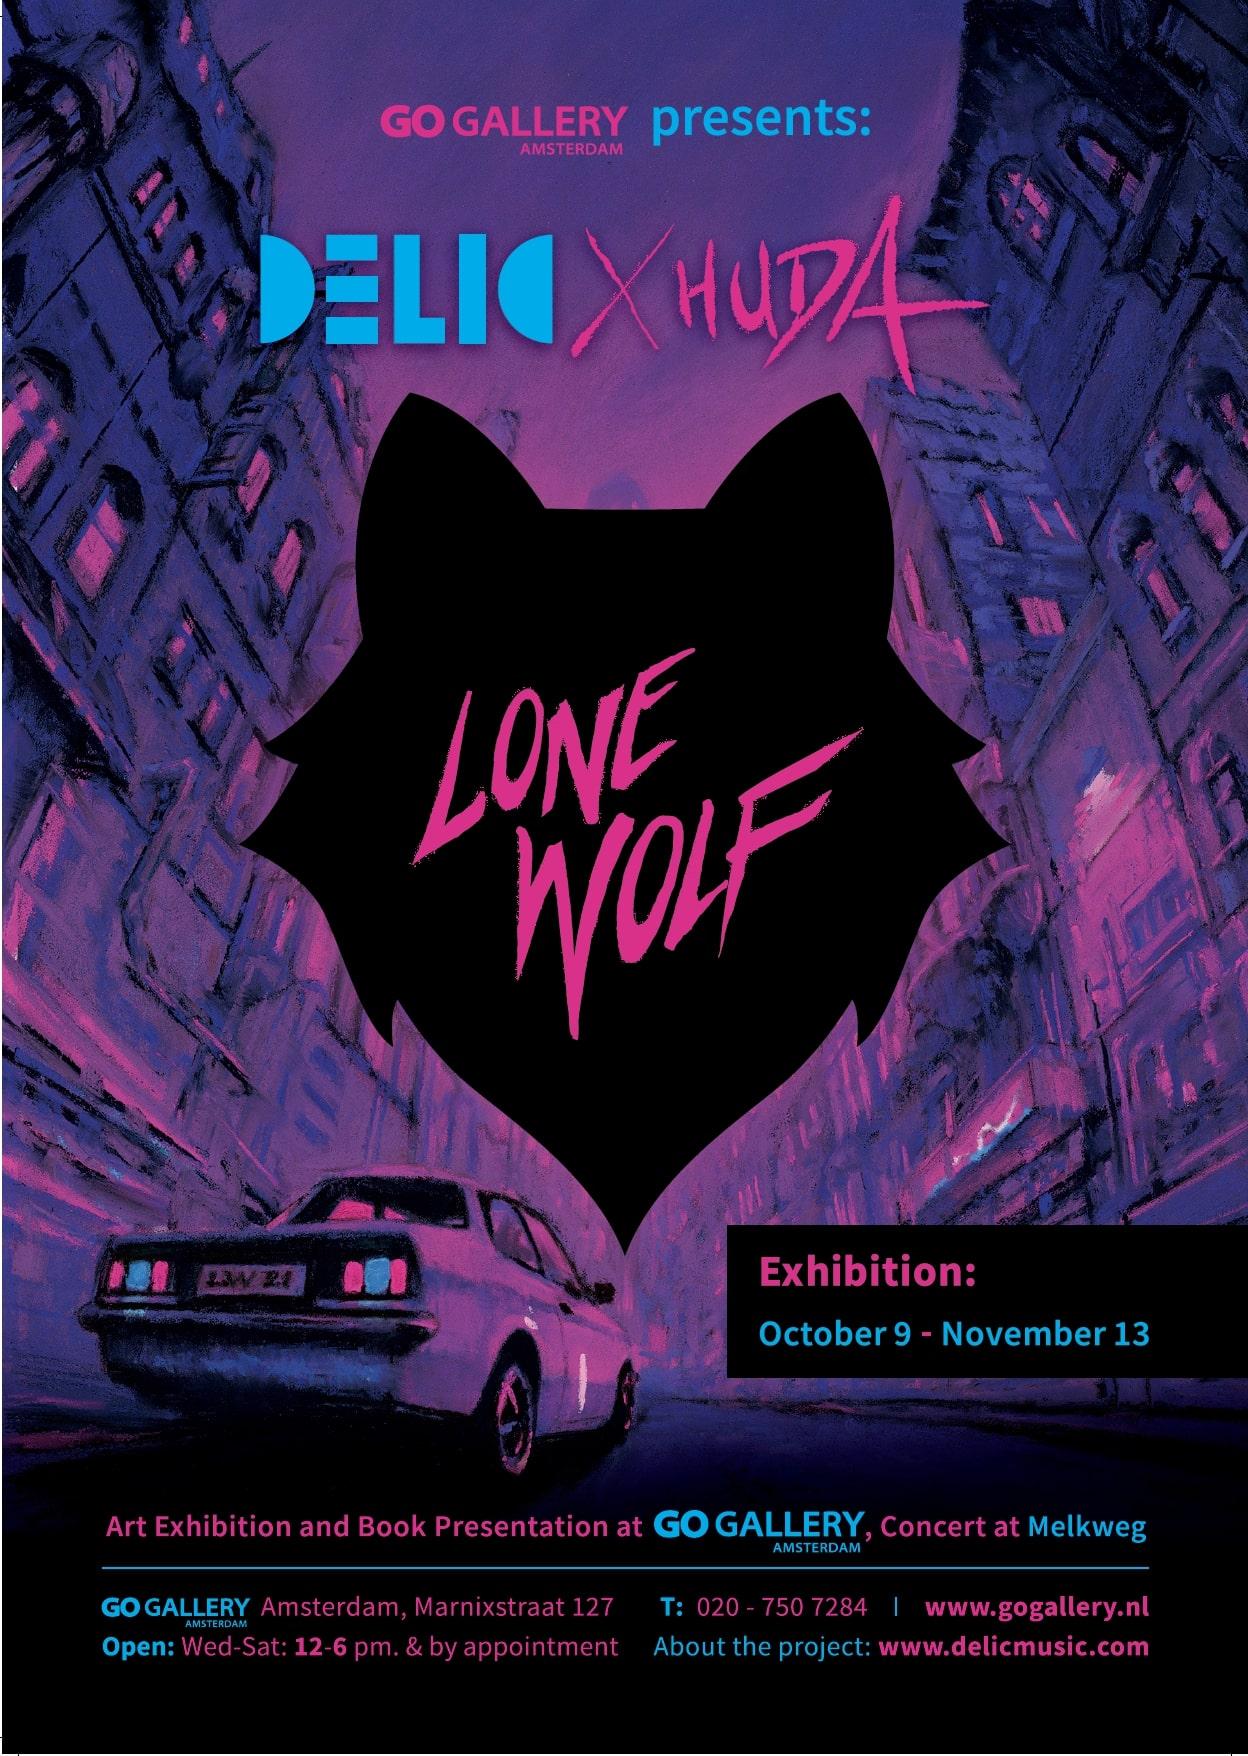 DELIC x HUDA - Lone wolf Exhibition October 9 - November 13